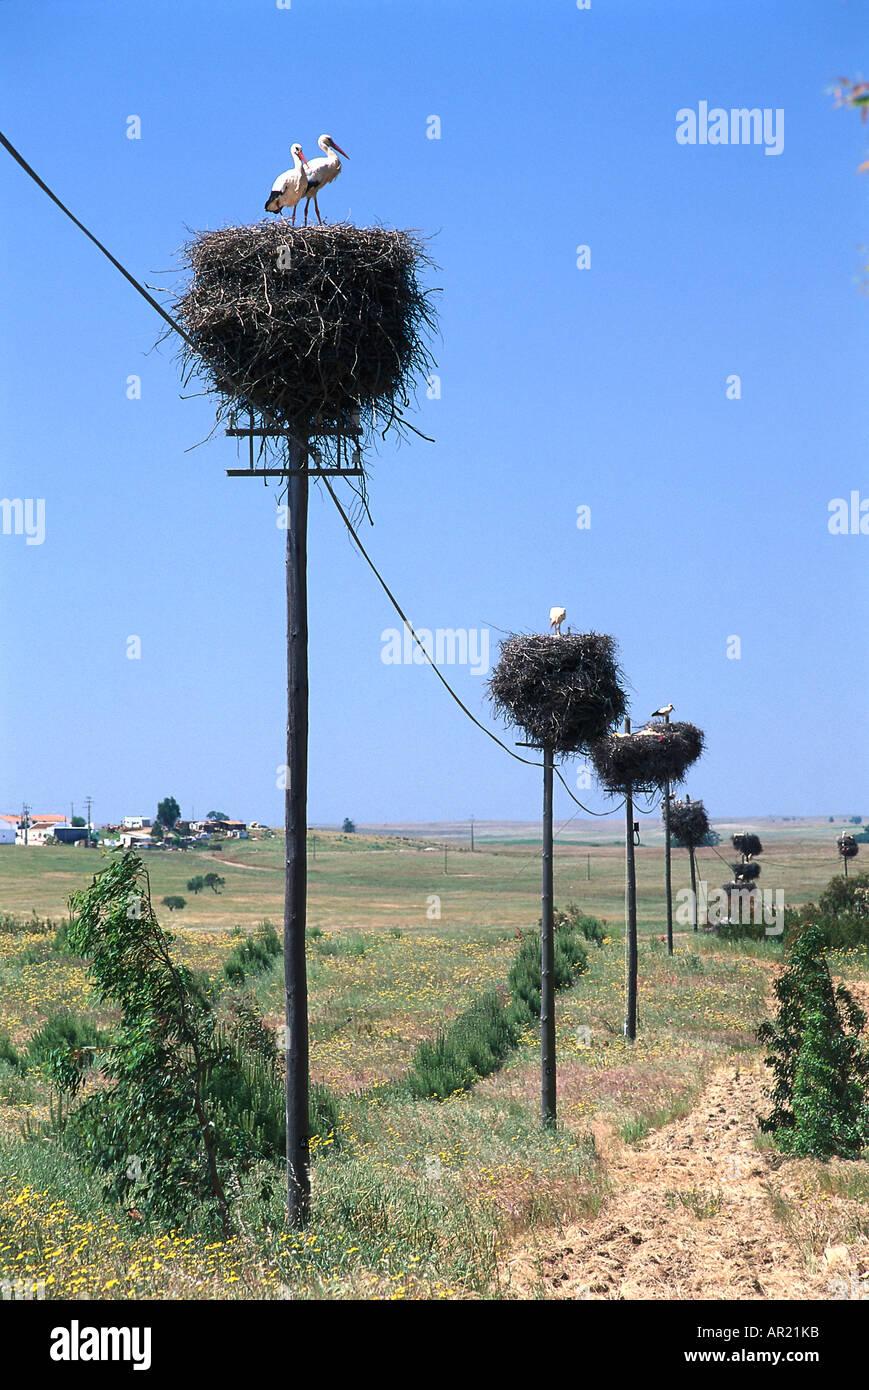 Stork nests on power poles, Alentejo, Portugal Stock Photo